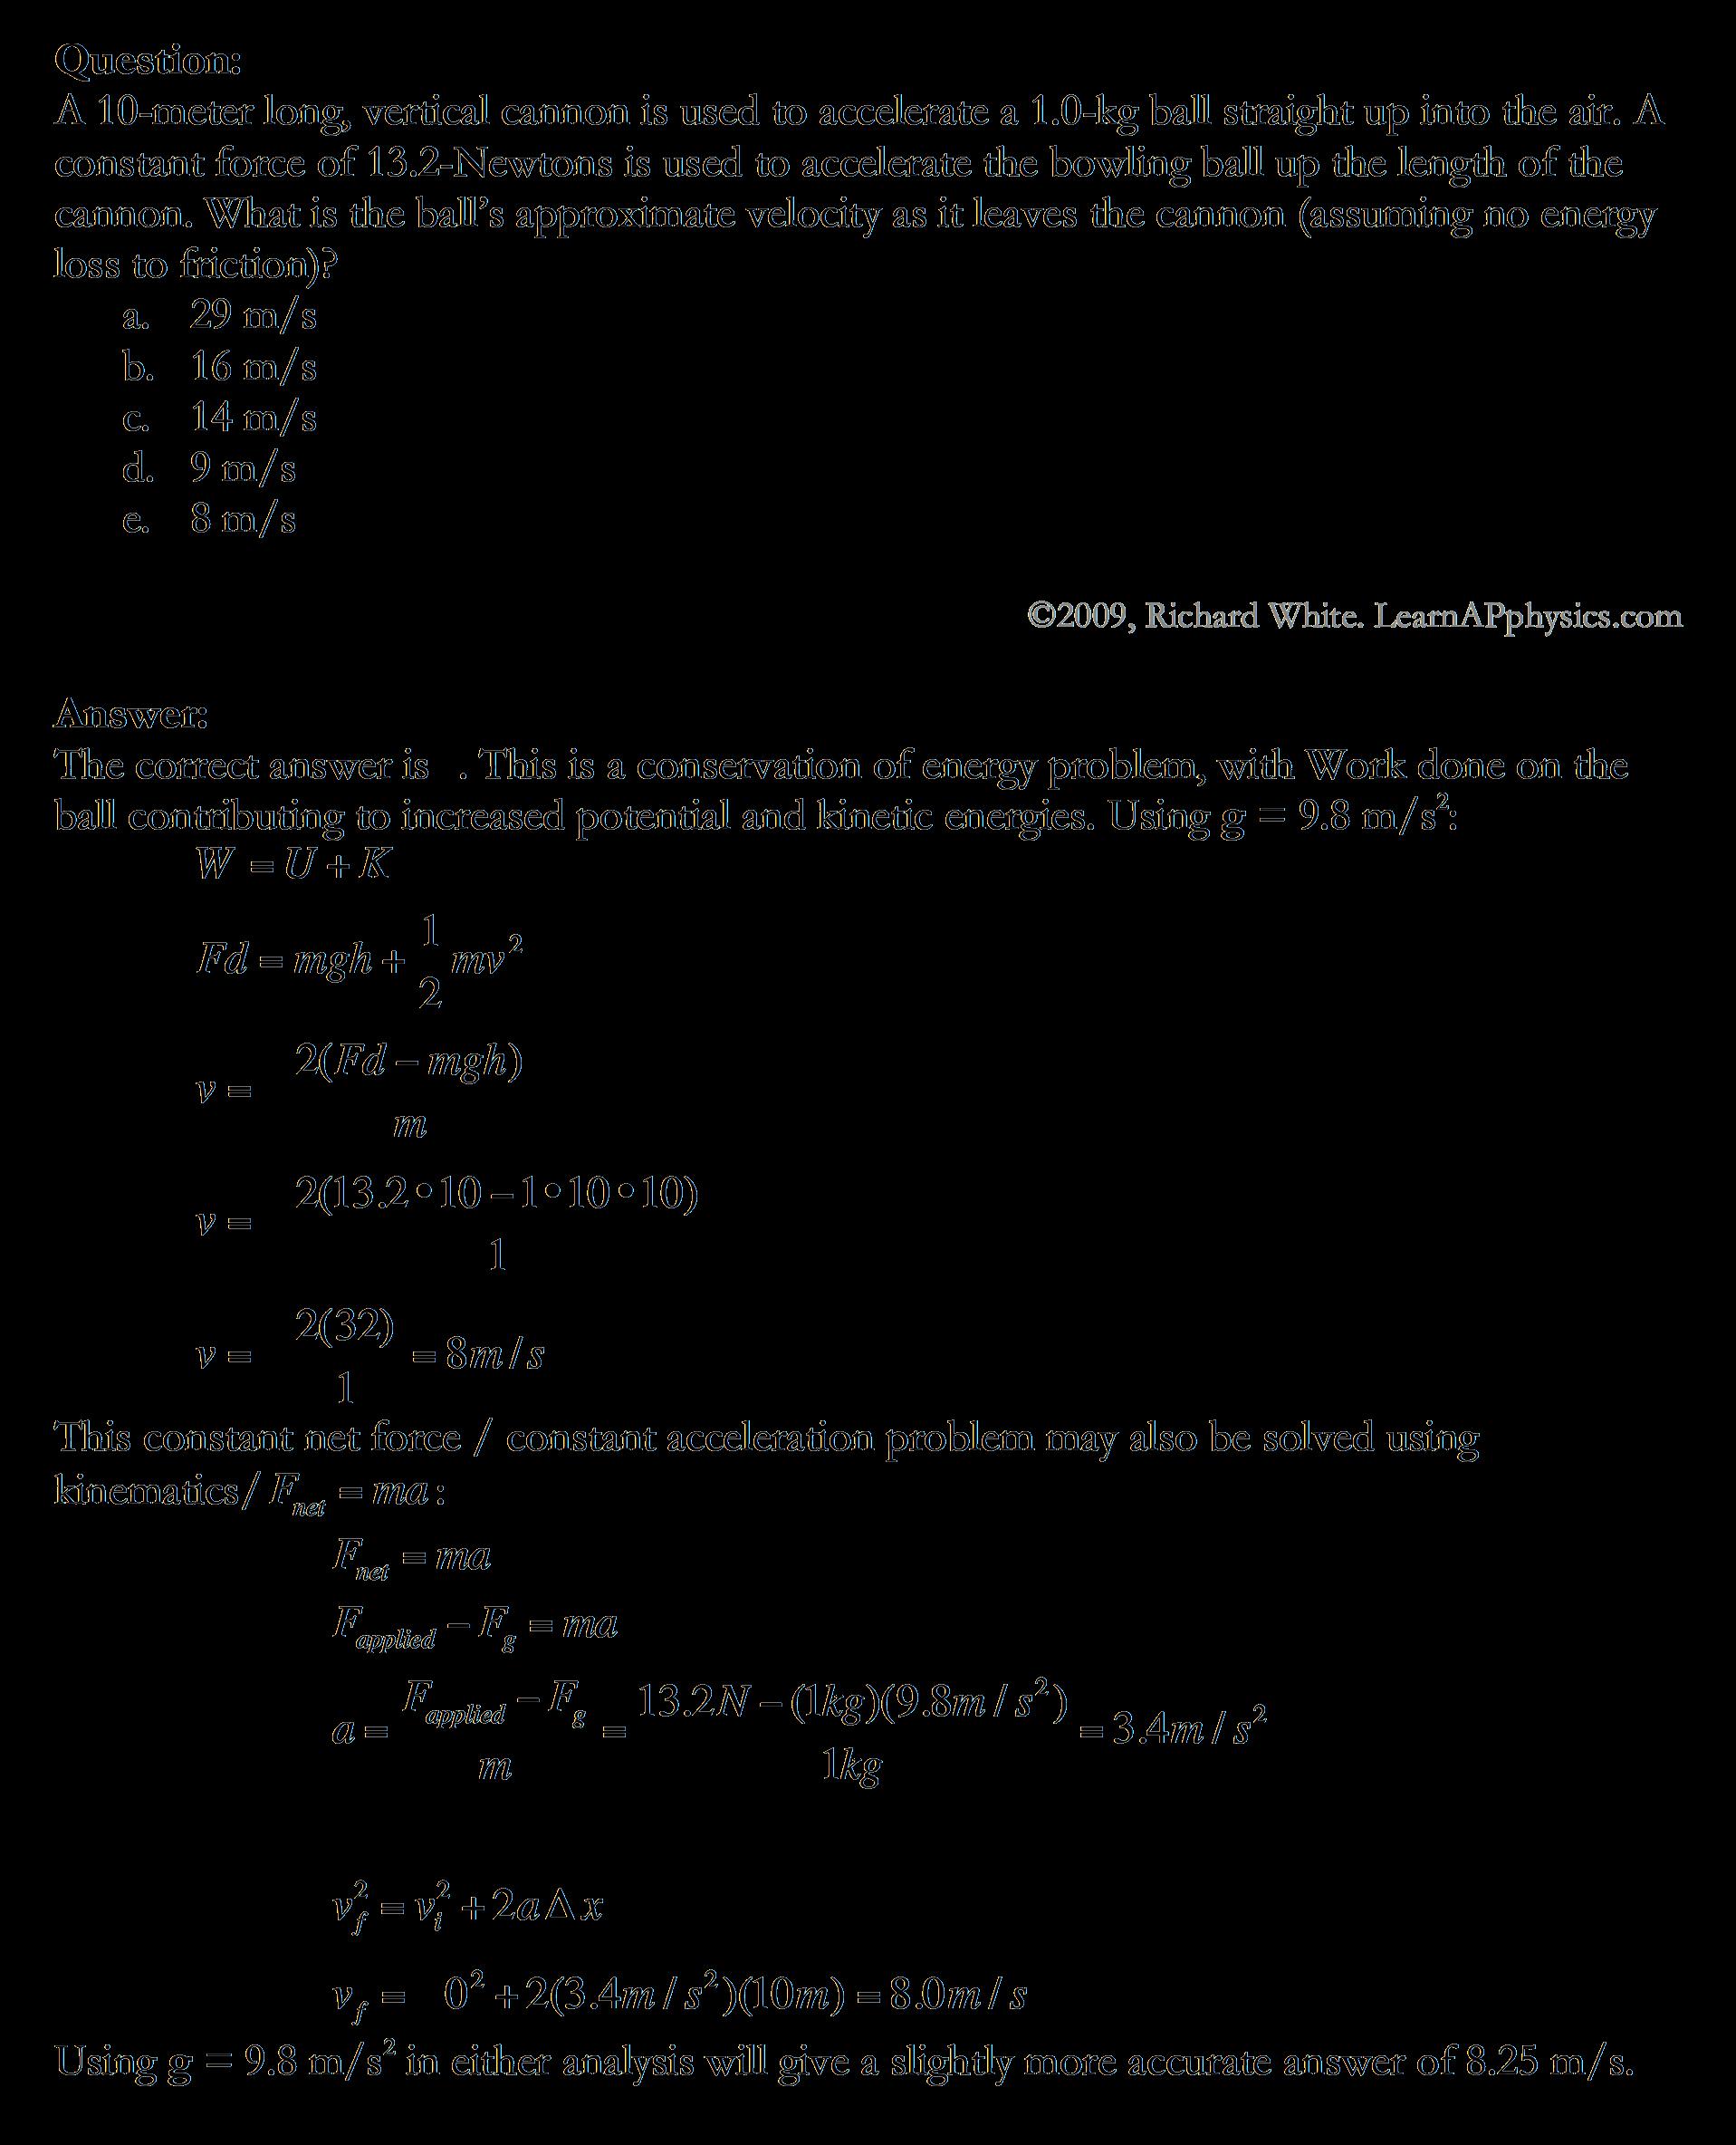 Kinematics Worksheet with Answers Beautiful Learn Ap Physics Ap Physics 1 & 2 Kinematics